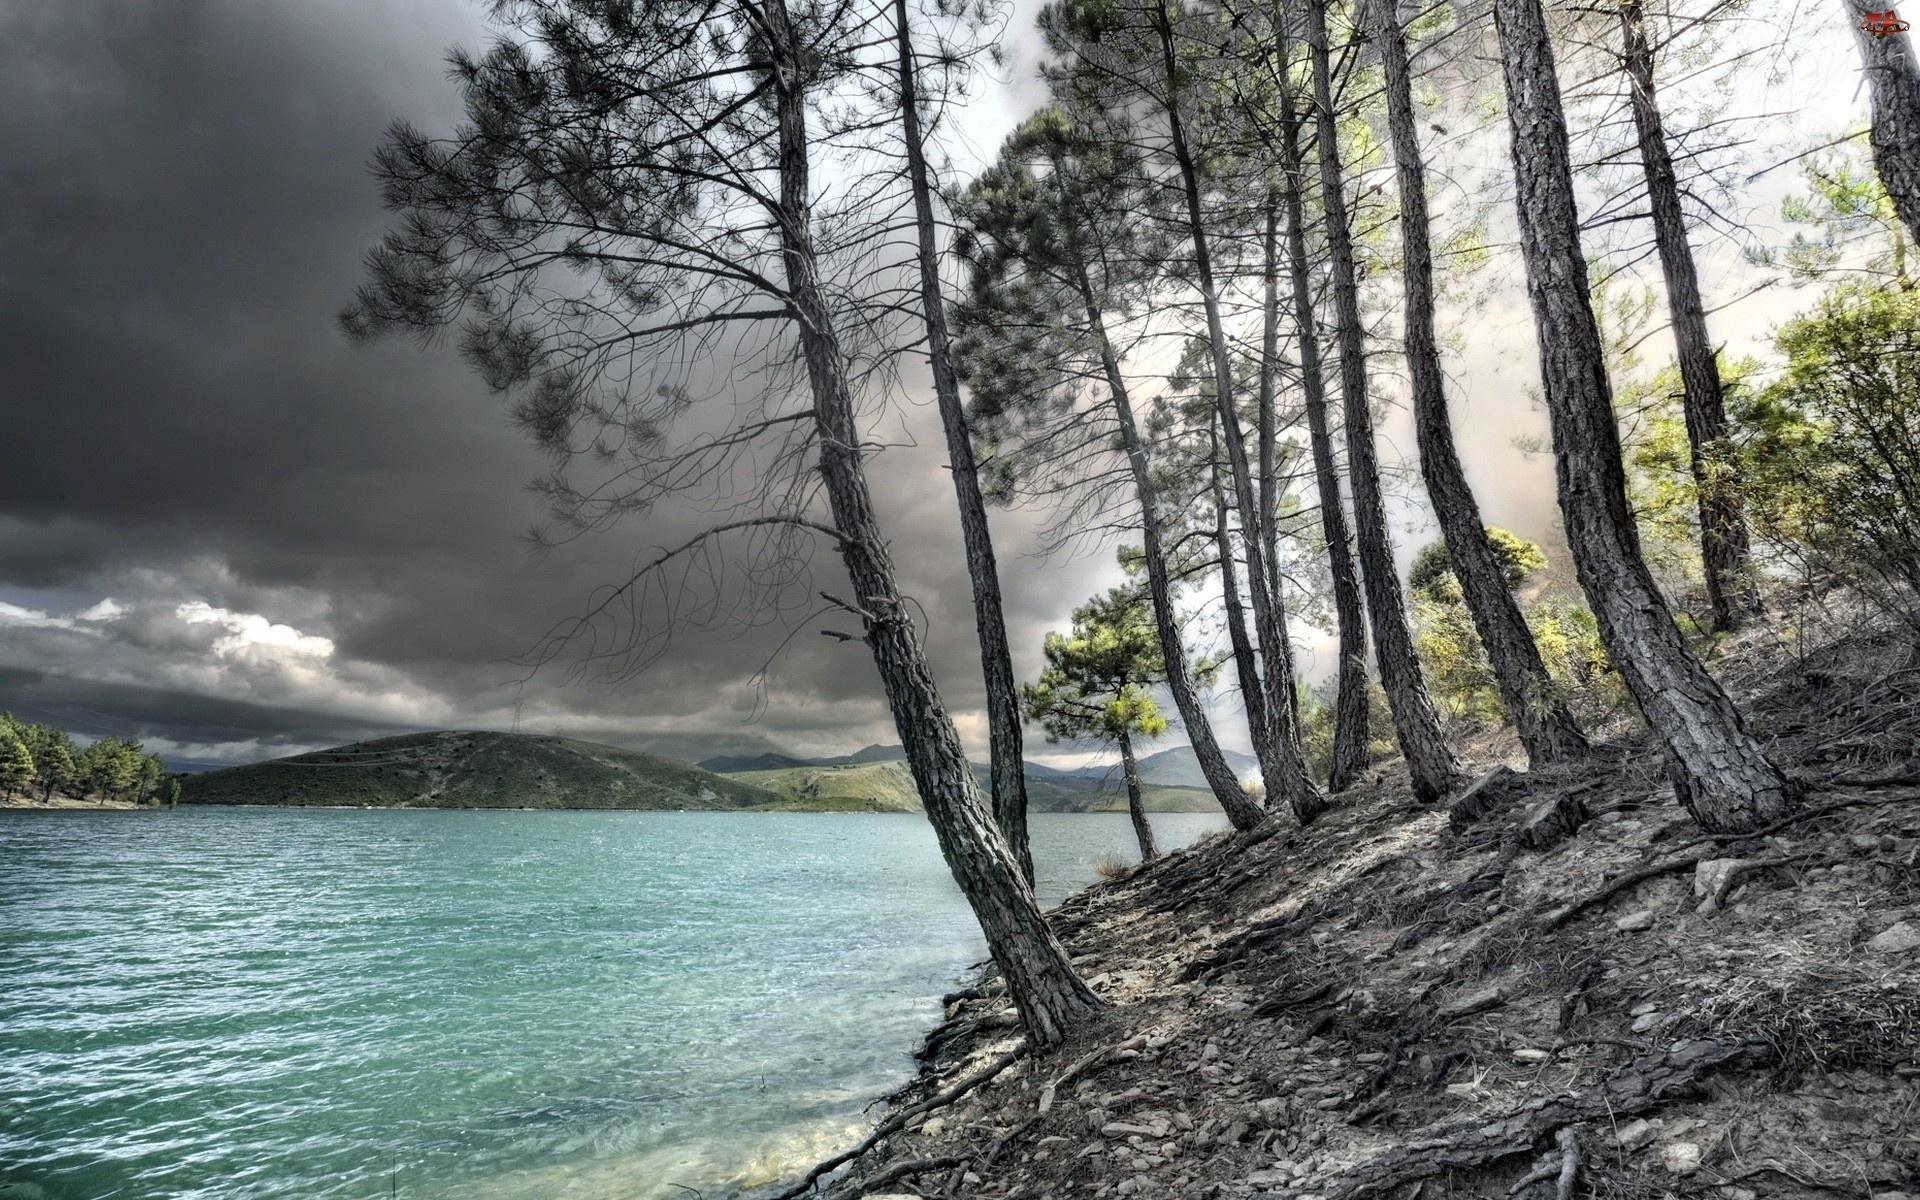 Jezioro, Skarpa, Chmury, Sosny